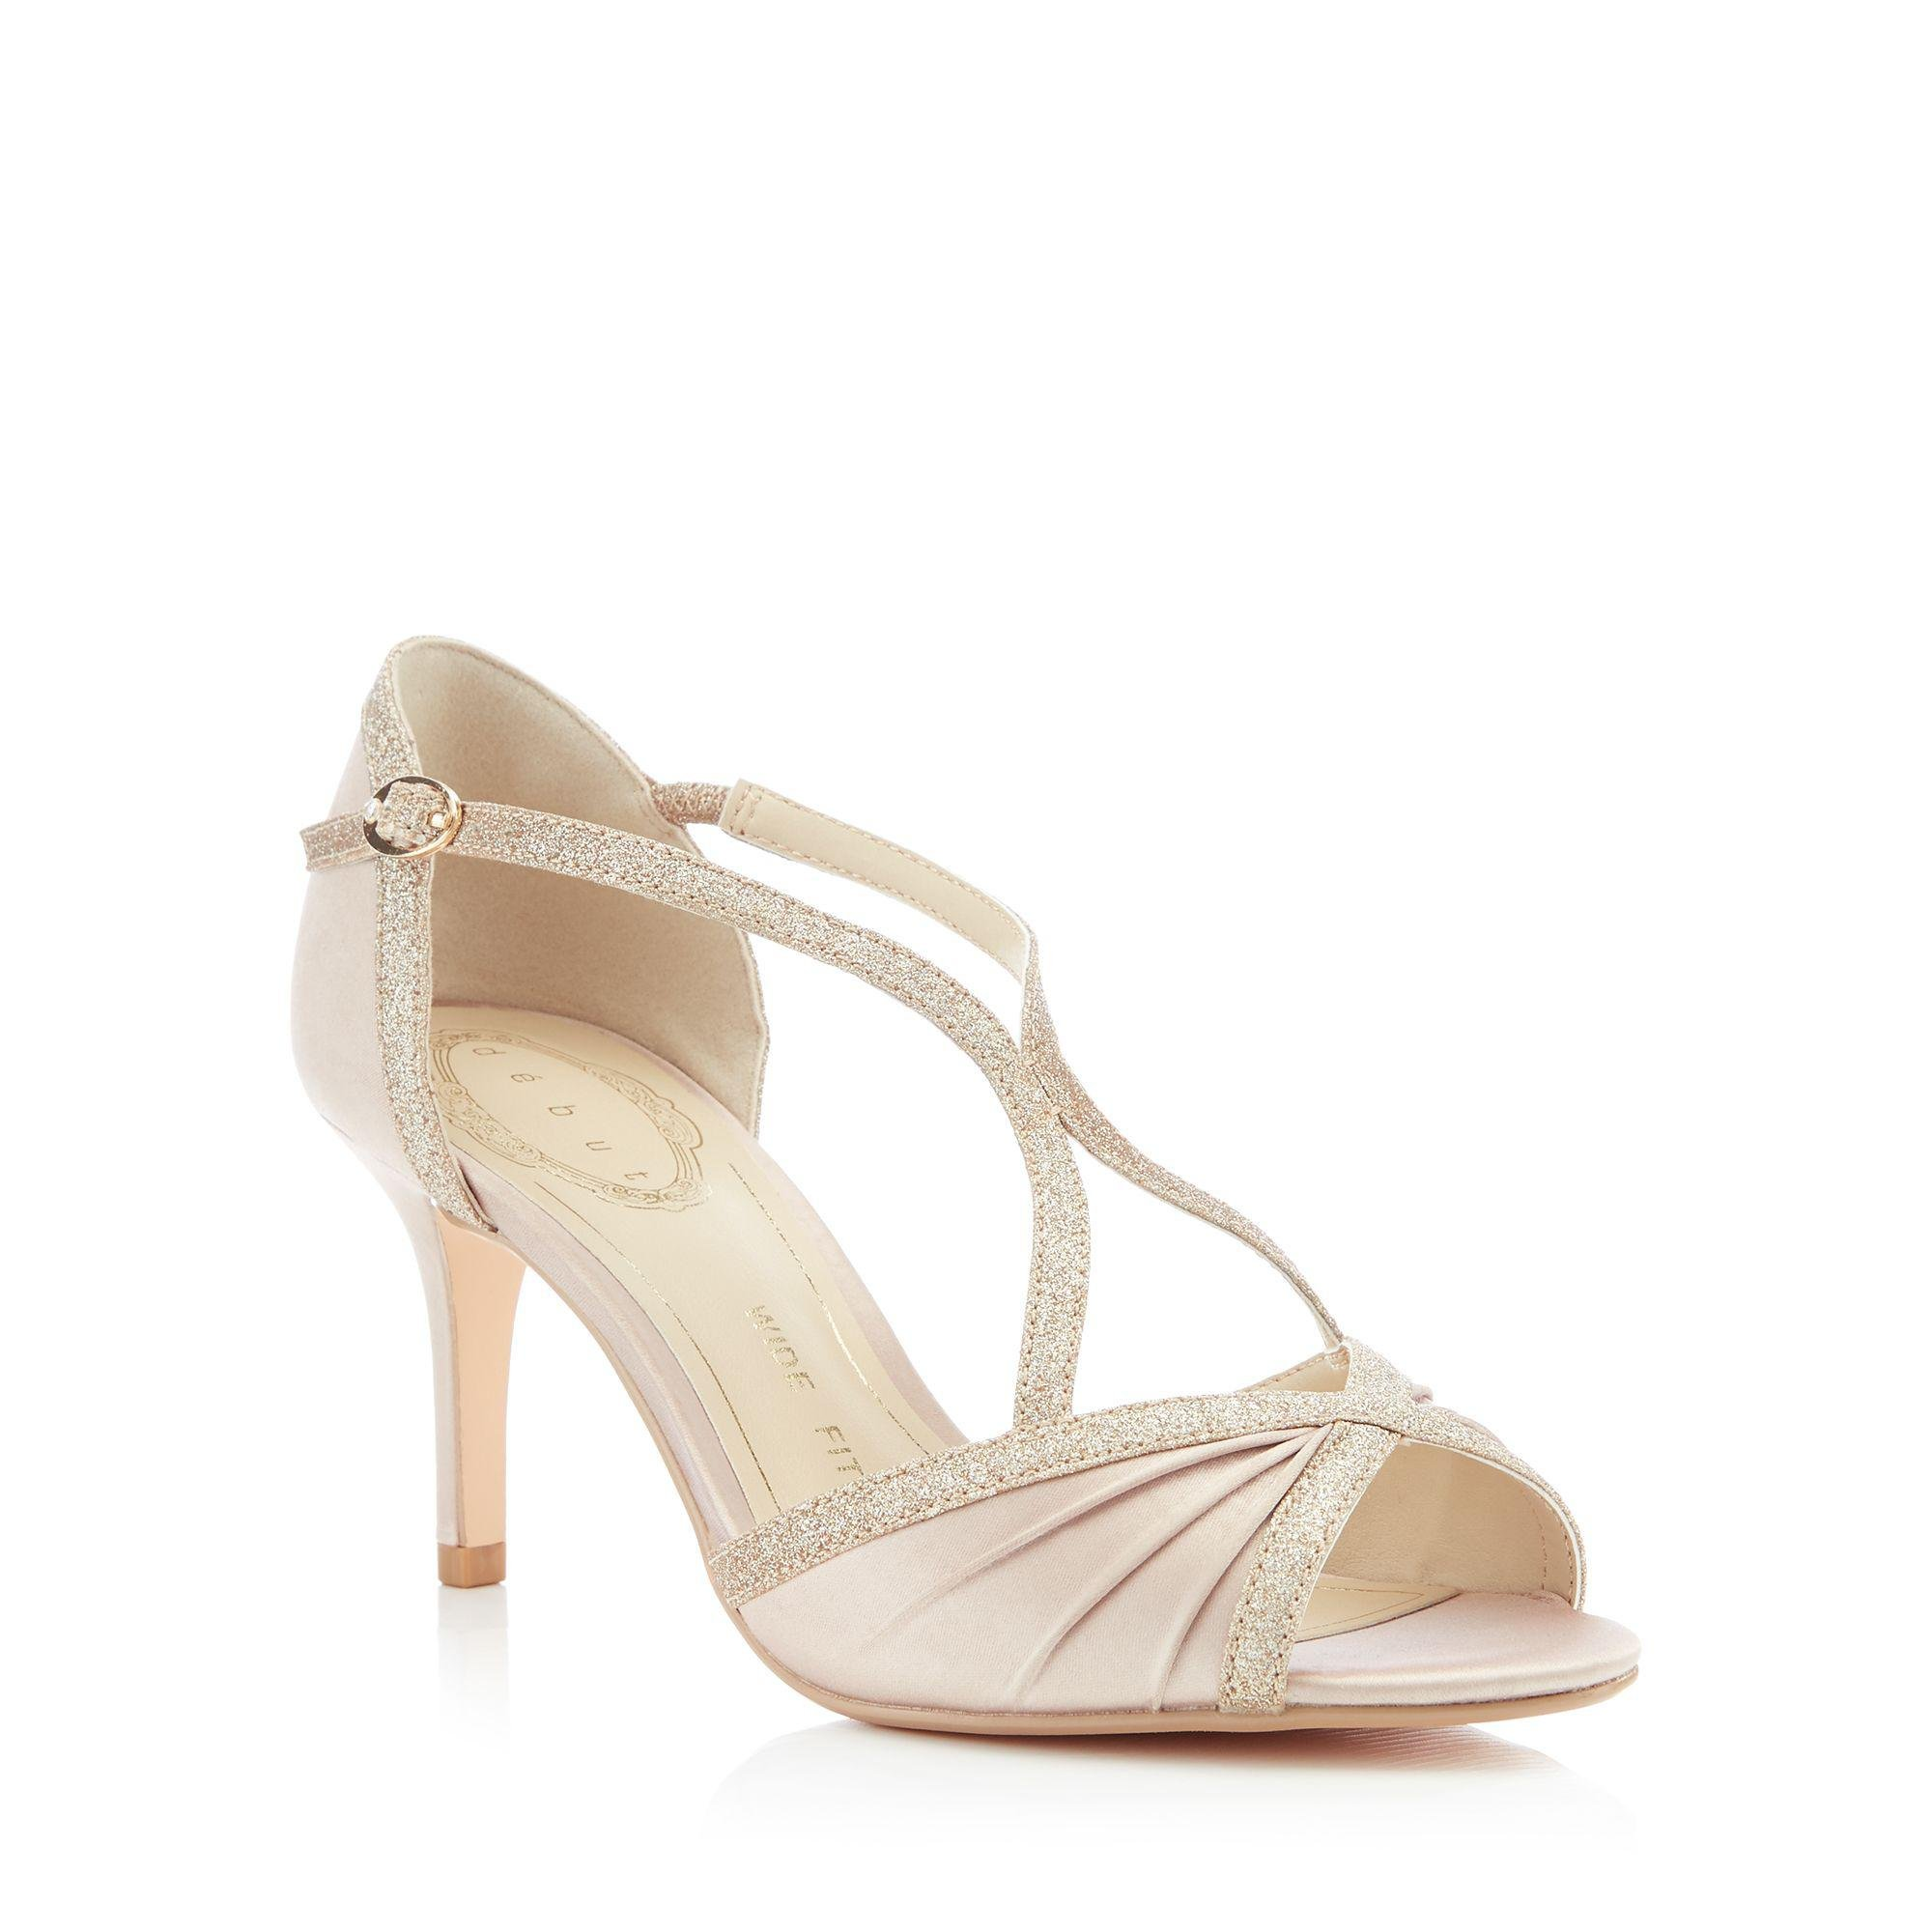 42f49849f1a Début Gold Satin  dancer  High Heel Wide Fit Ankle Strap Sandals in ...